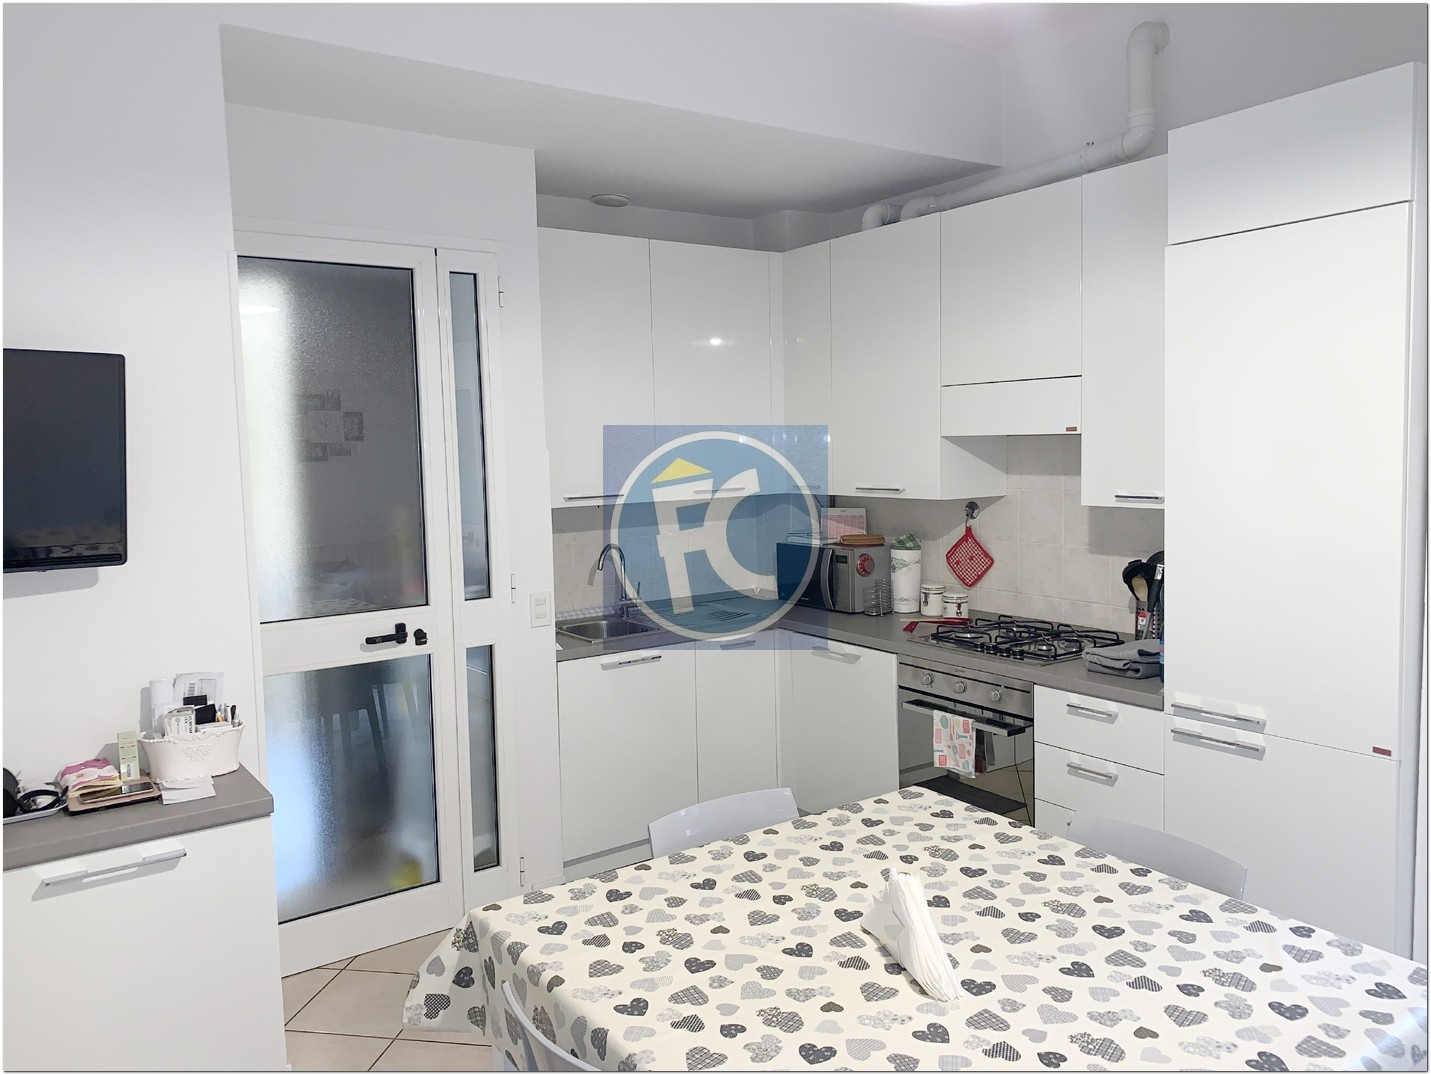 Monolocali In Vendita A Parigi appartamenti in vendita